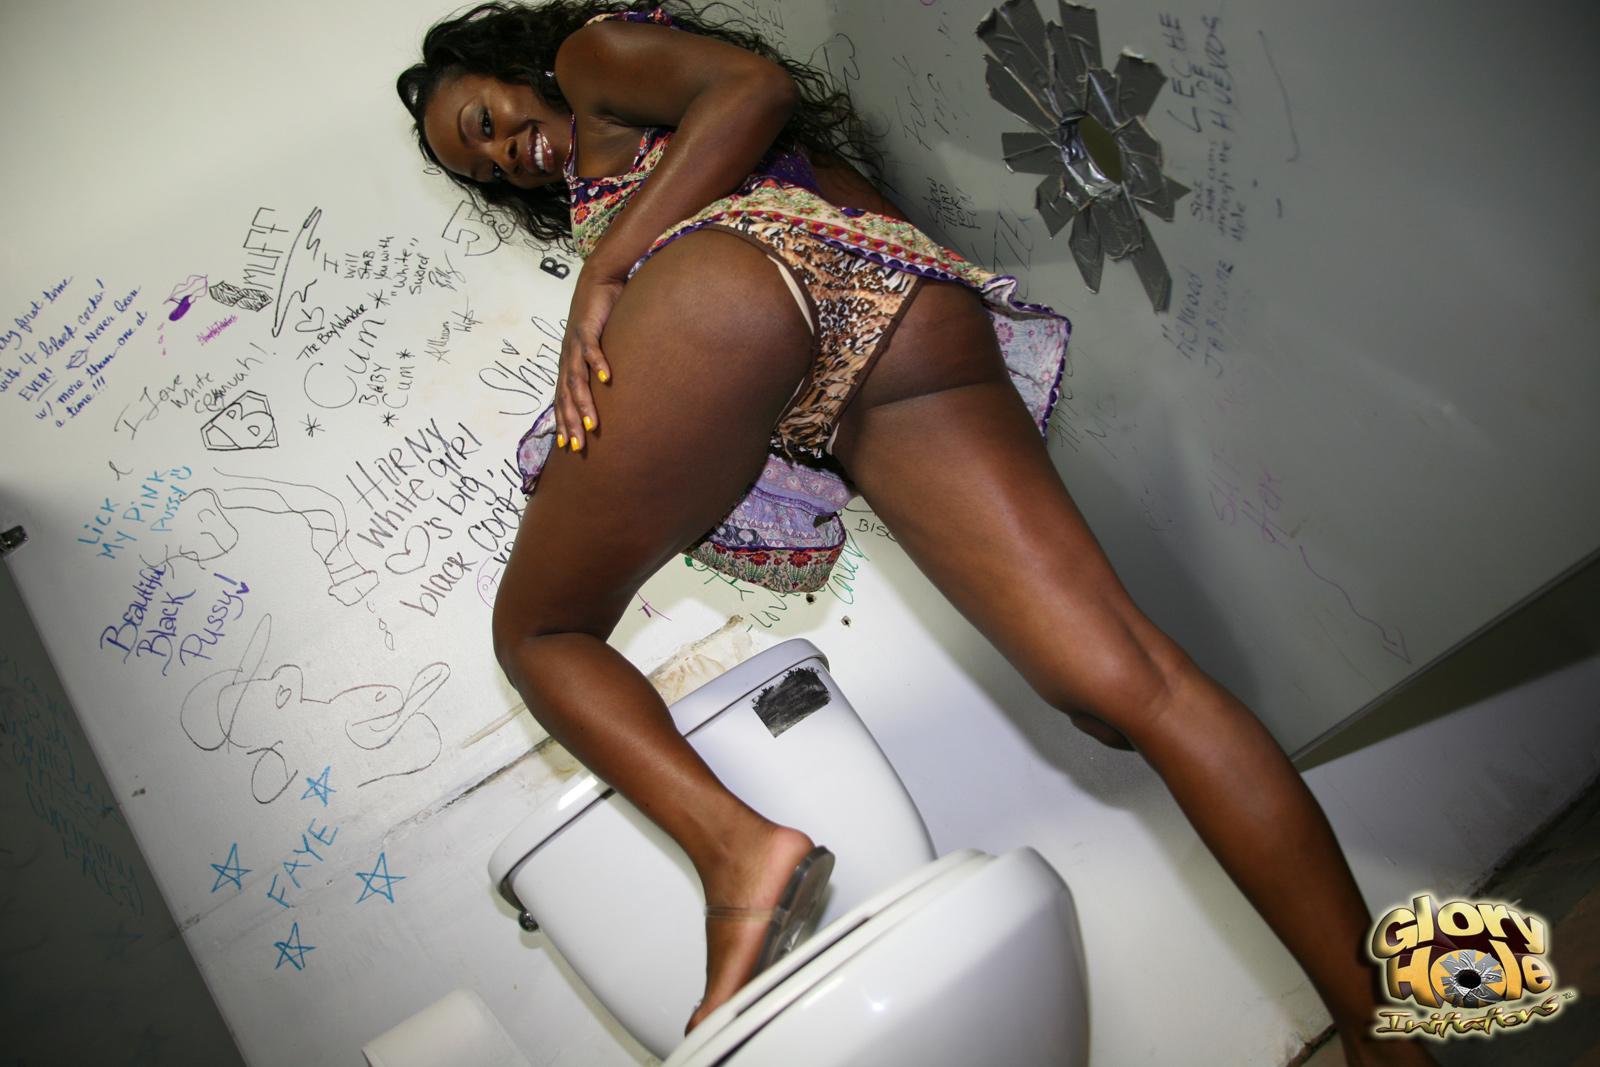 Black girl naked sexing